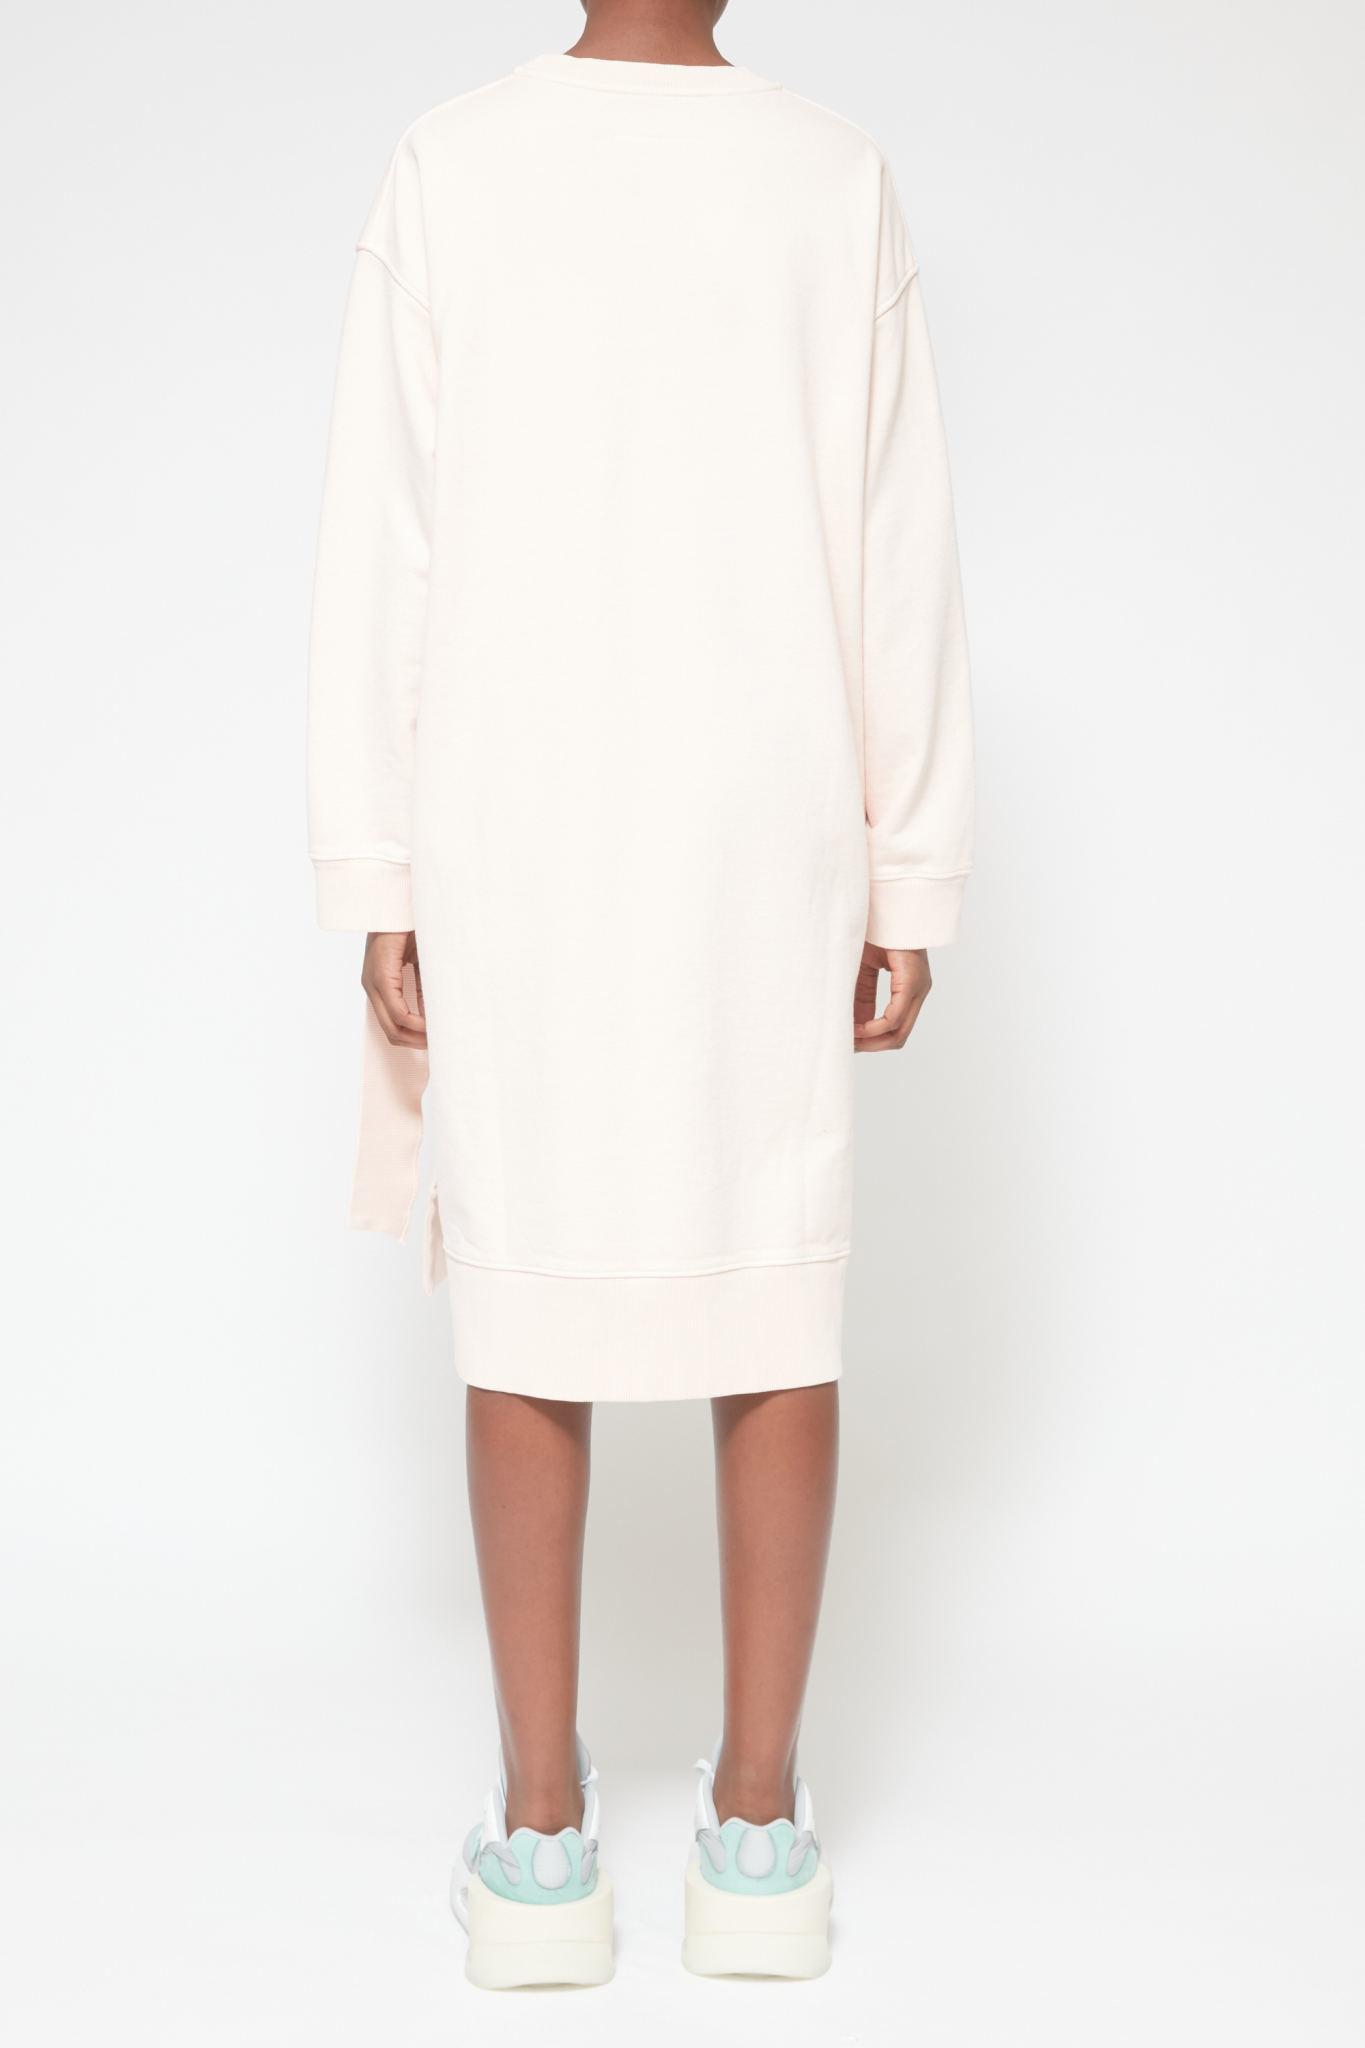 MM6 MAISON MARGIELA Layered Sweatshirt Dress in Blush